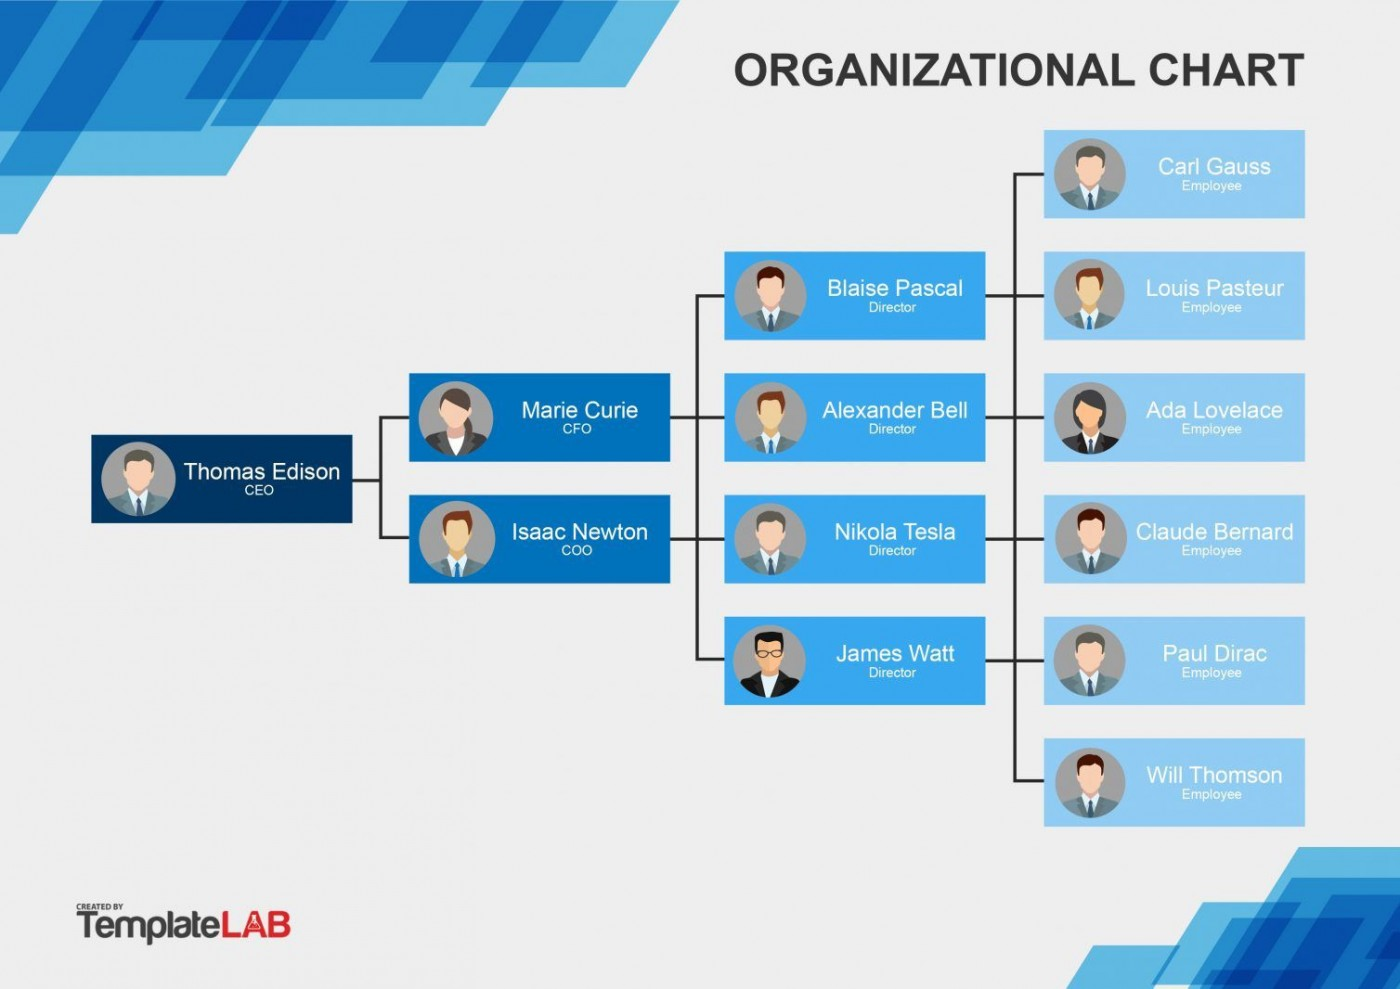 007 Beautiful Organization Chart Template Word 2013 Image  Organizational Free In Microsoft1400